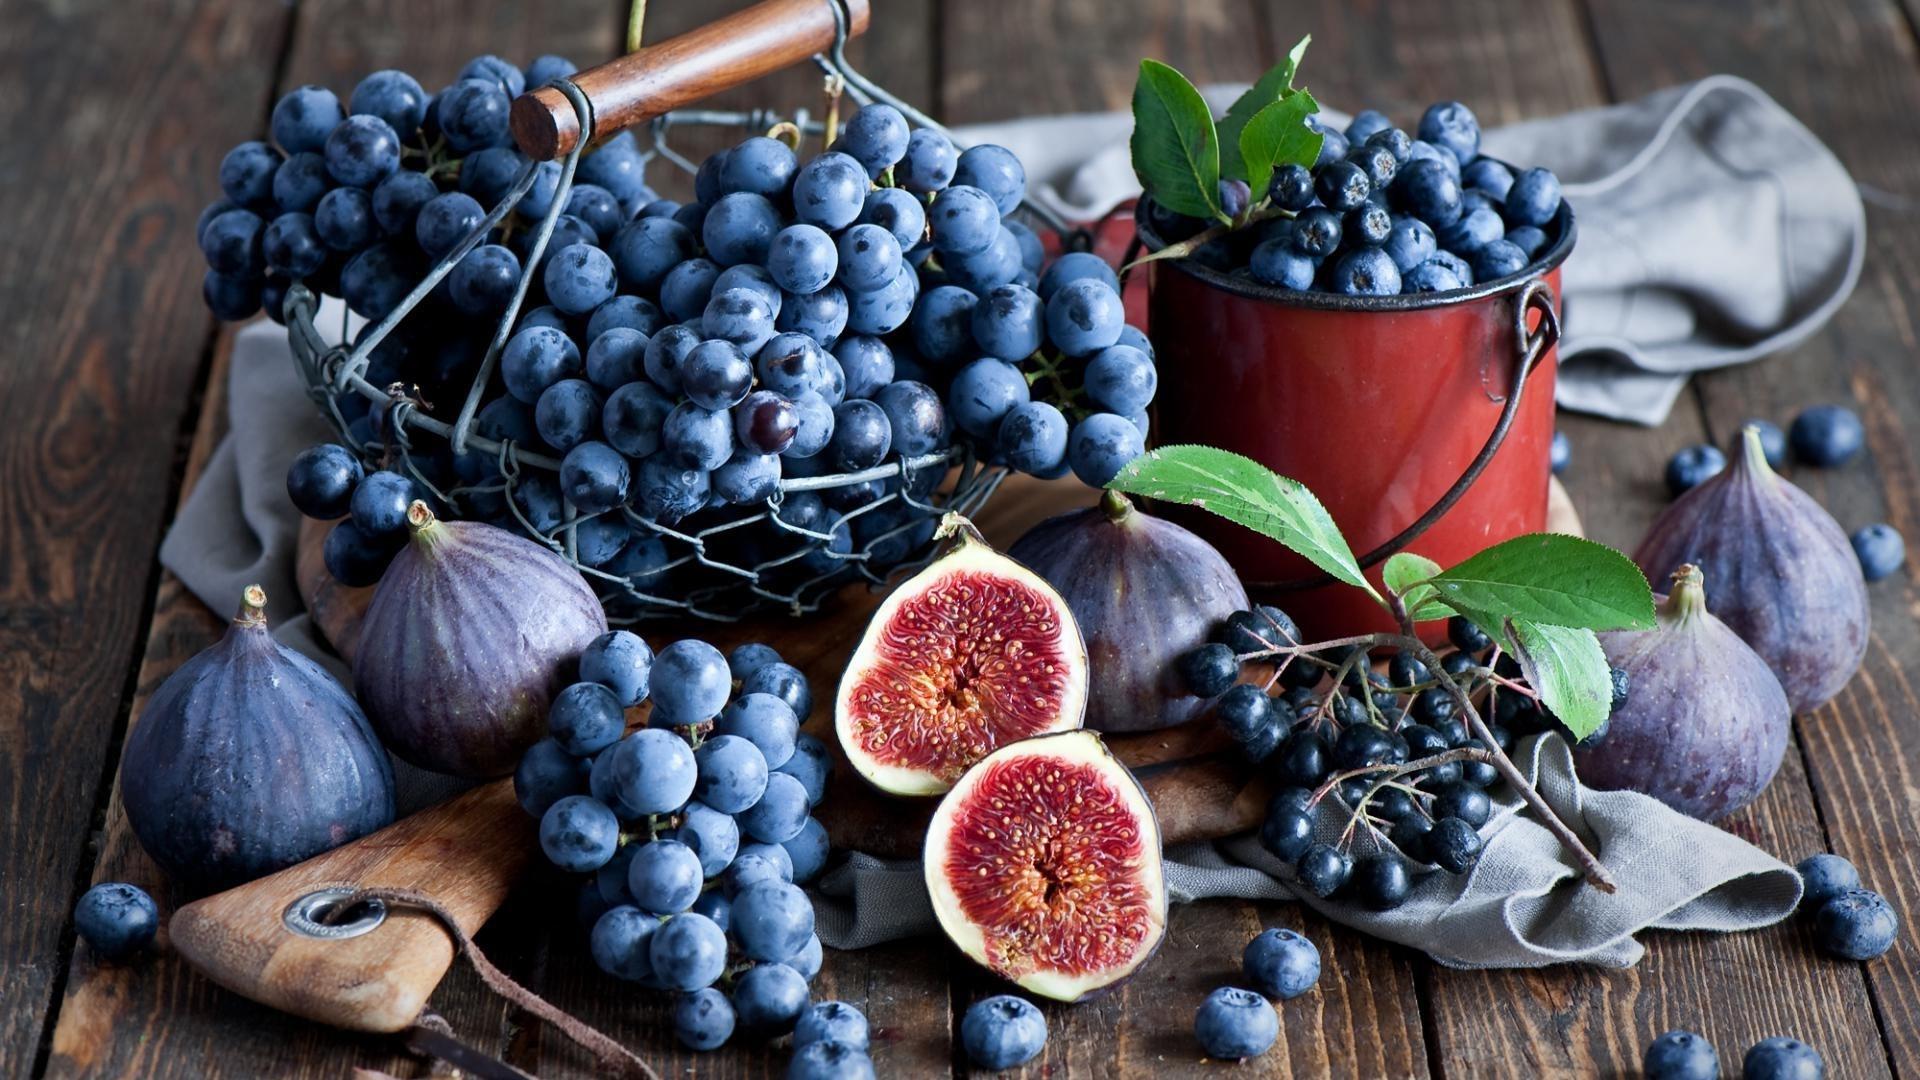 Blueberries desktop wallpaper hd